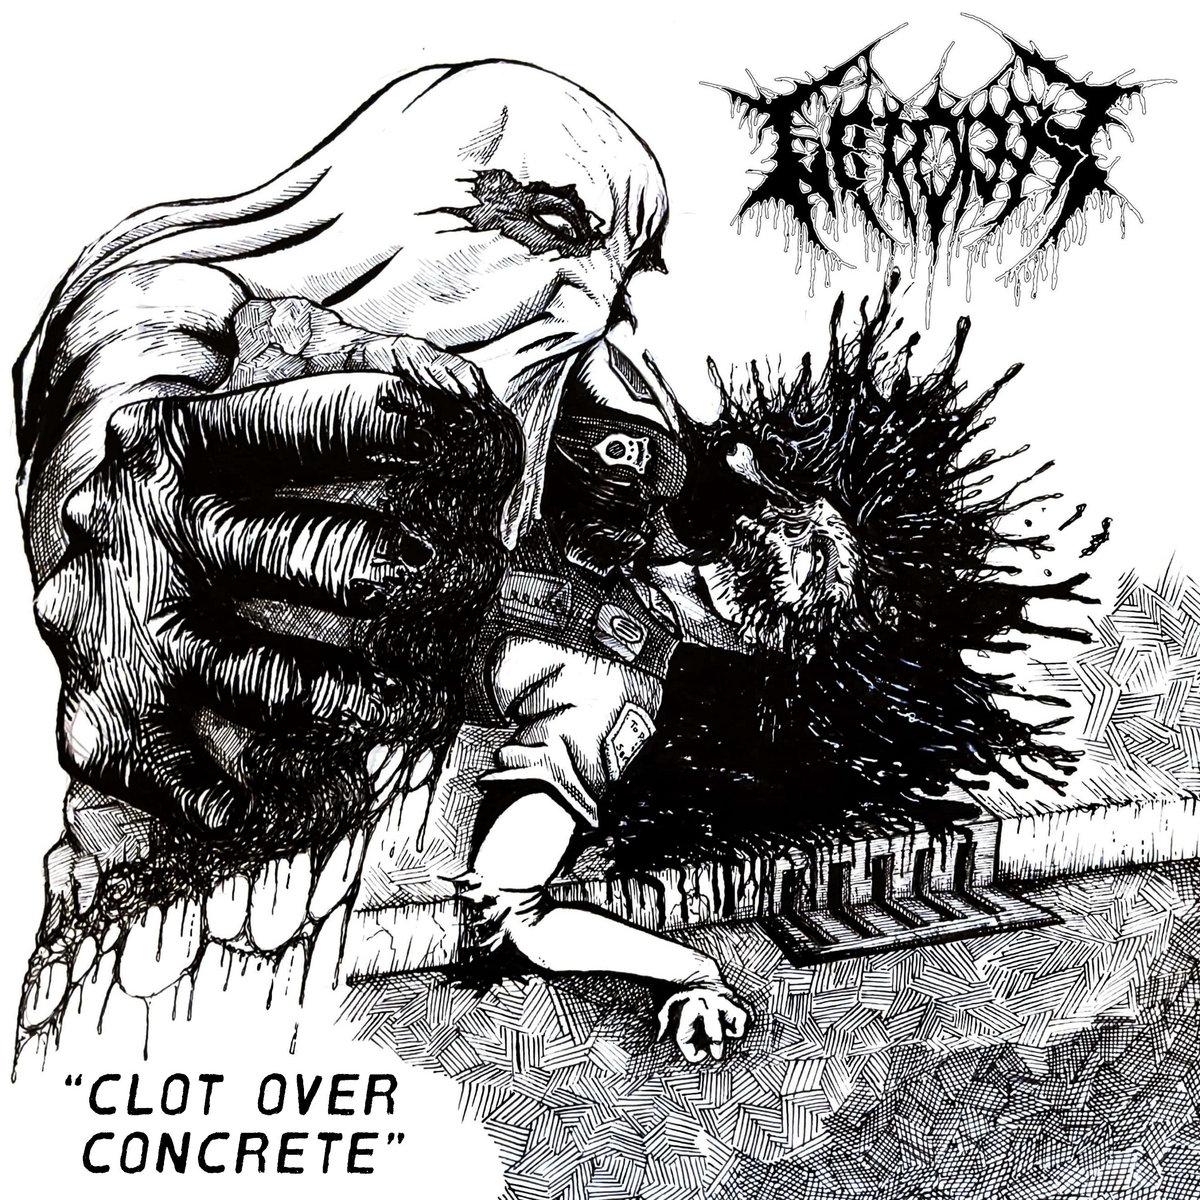 "NECROLEPSY RELEASE ""CLOT OVER CONCRETE"" SINGLE (STREAM ONLINE) http://musicextreme666.blogspot.com/2020/08/necrolepsy-release-clot-over-concrete.html… @NecrolepsyBand  #necrolepsy #Metal #deathmetal #deathgrind #musicextreme #music #música #art #arte #band #wednesdaymorning #WednesdayThoughts #WednesdayVibes RTpic.twitter.com/VKhgV9A1UH"